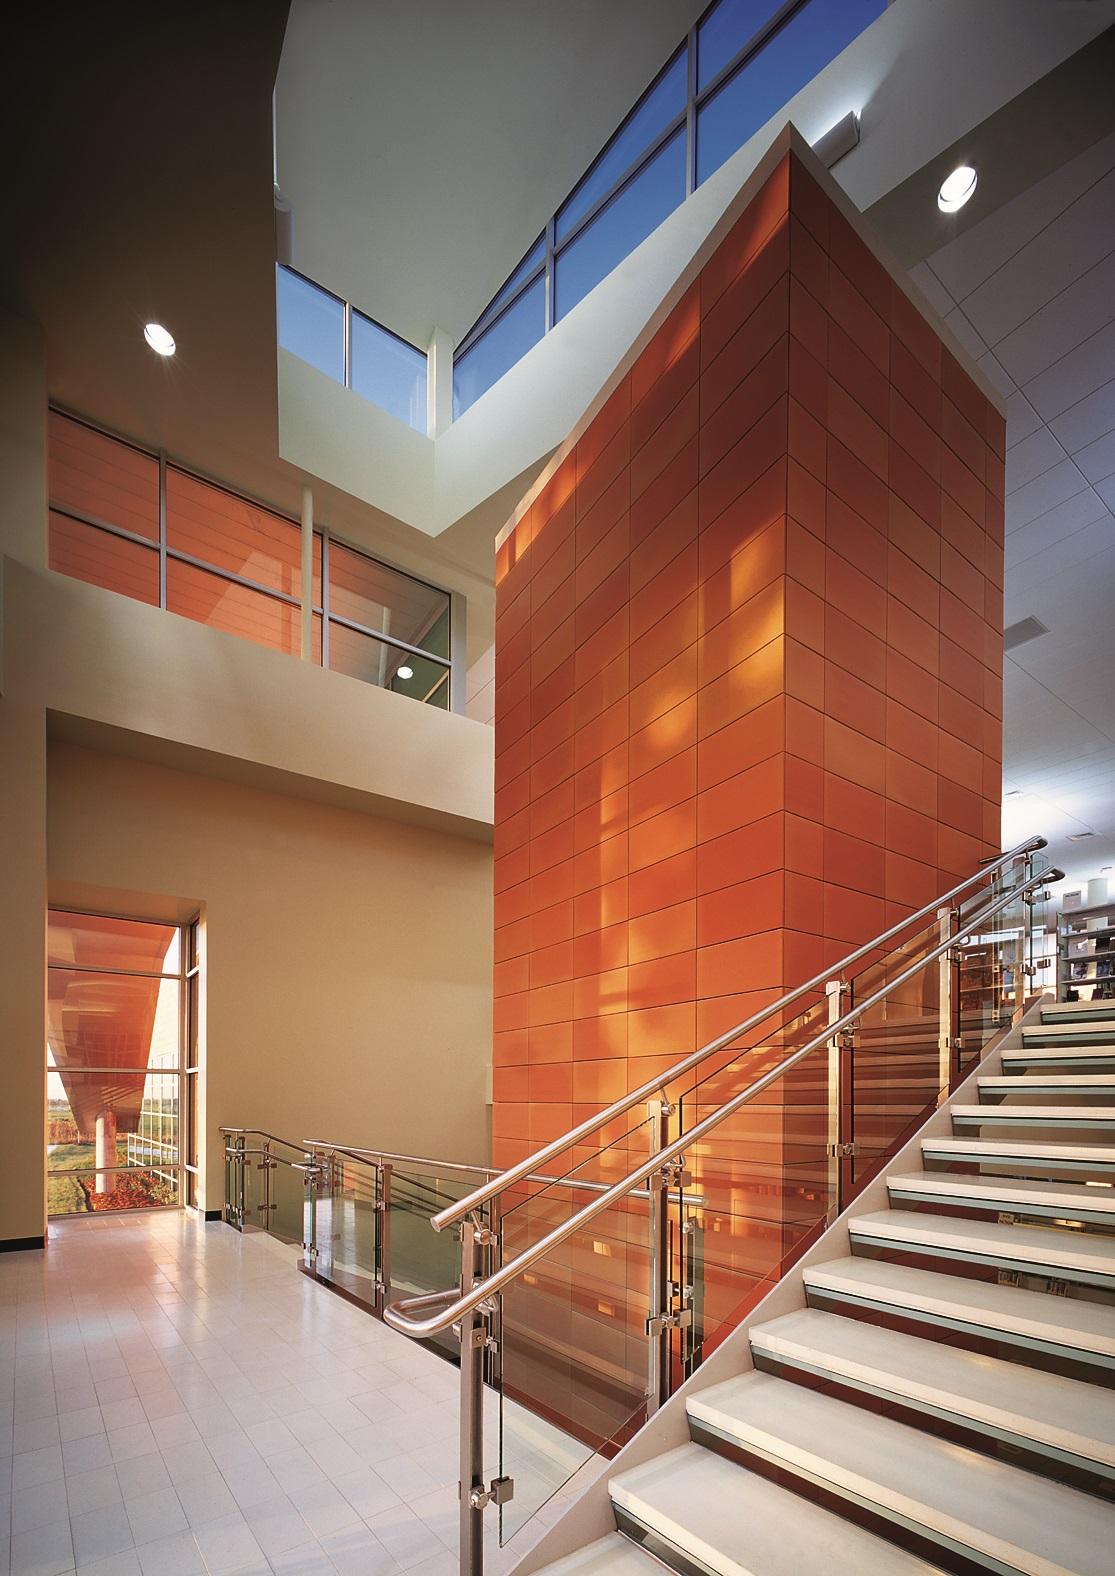 Kubit Glass Railing At Market Axess Nyc: Steel Railing Systems